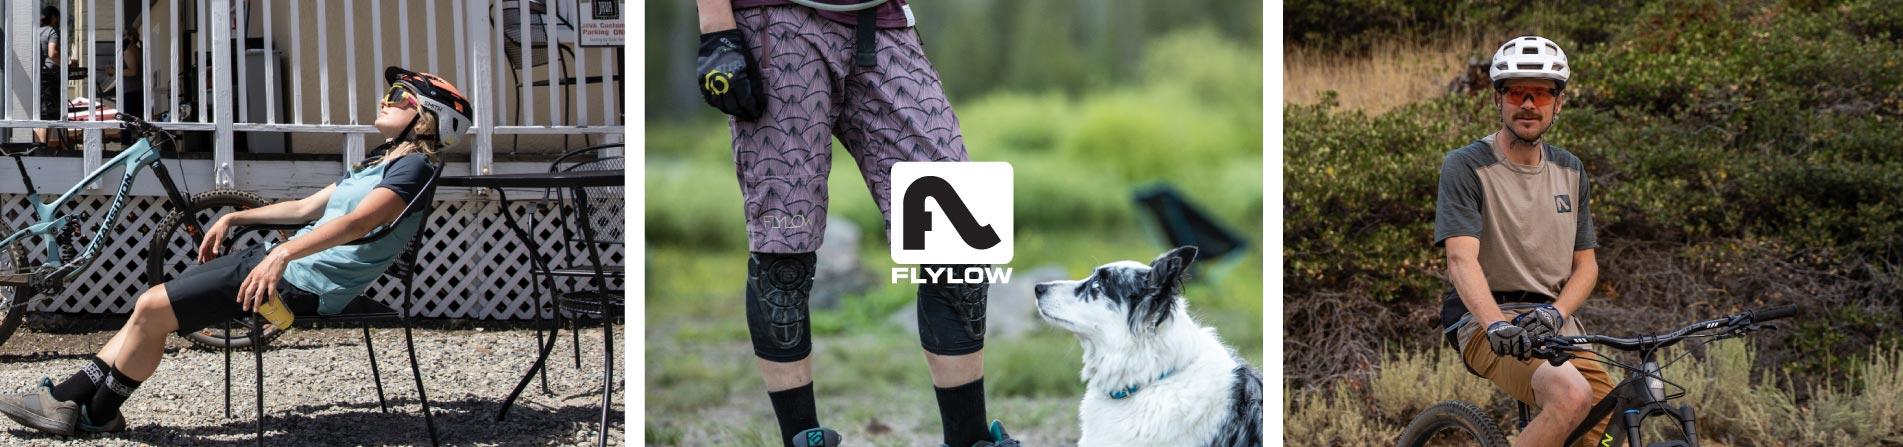 flylow-brand-banner.jpg